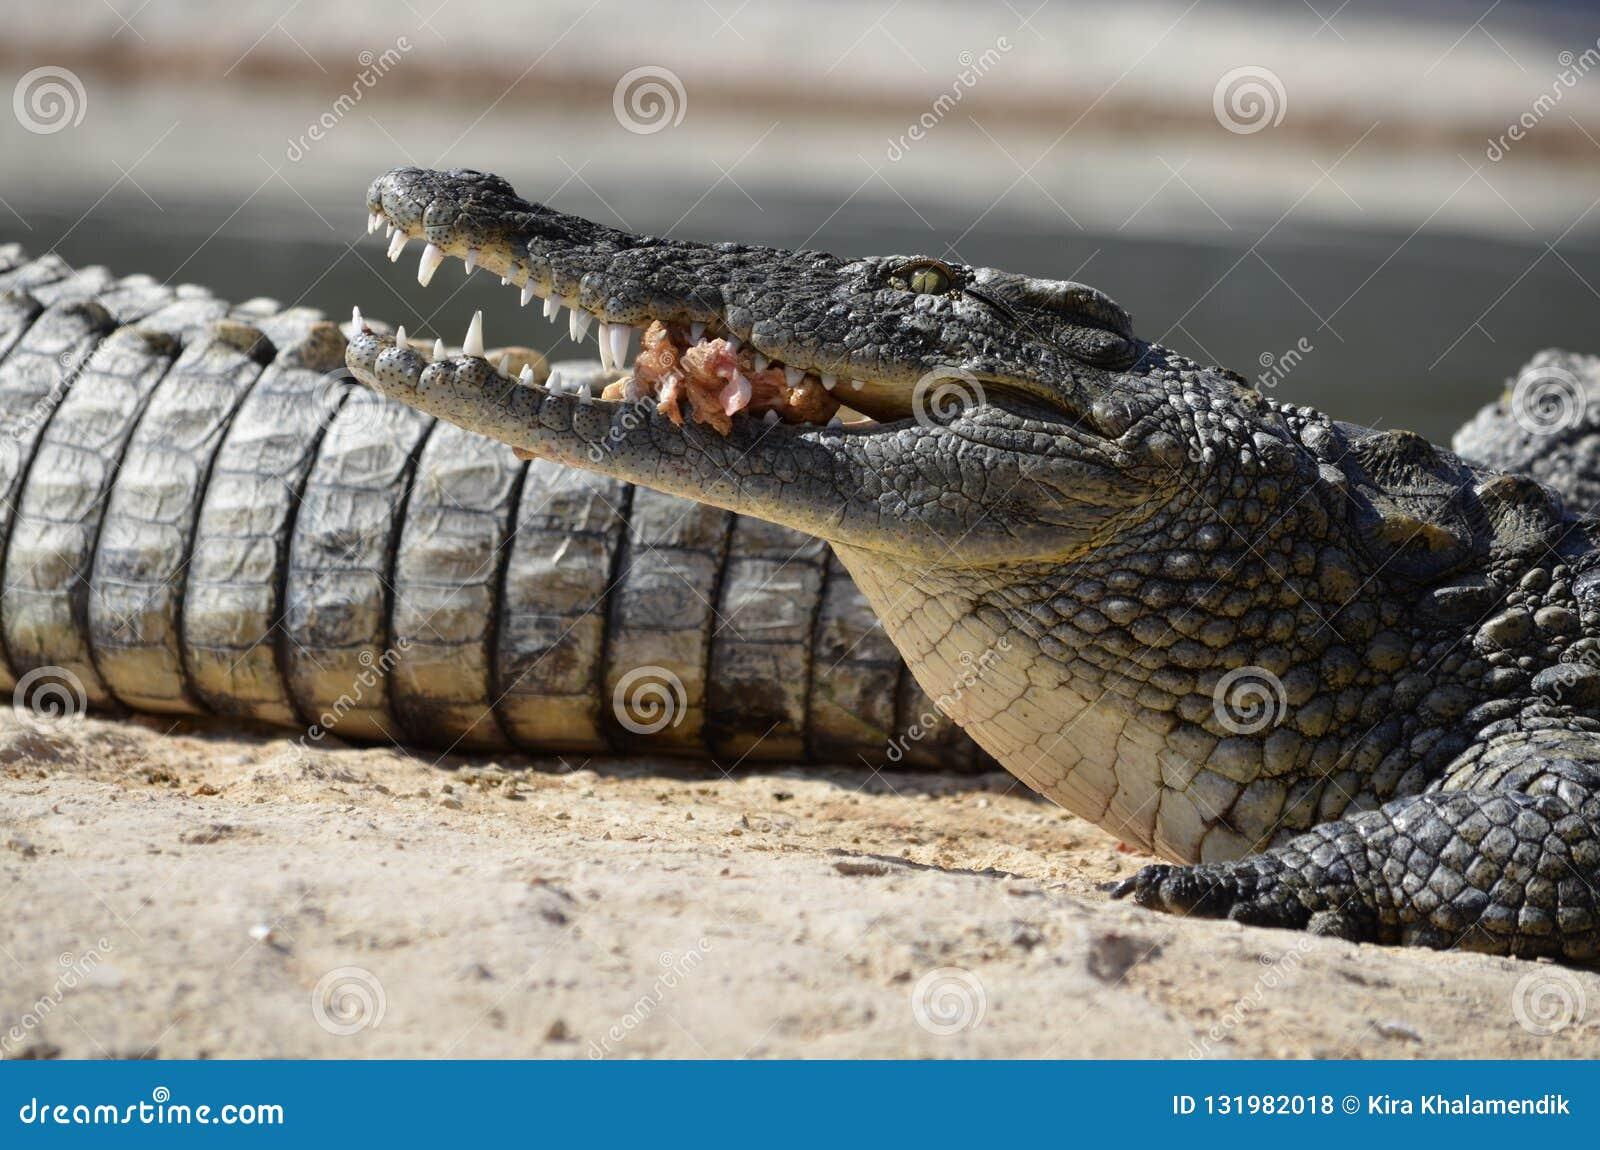 African crocodiles